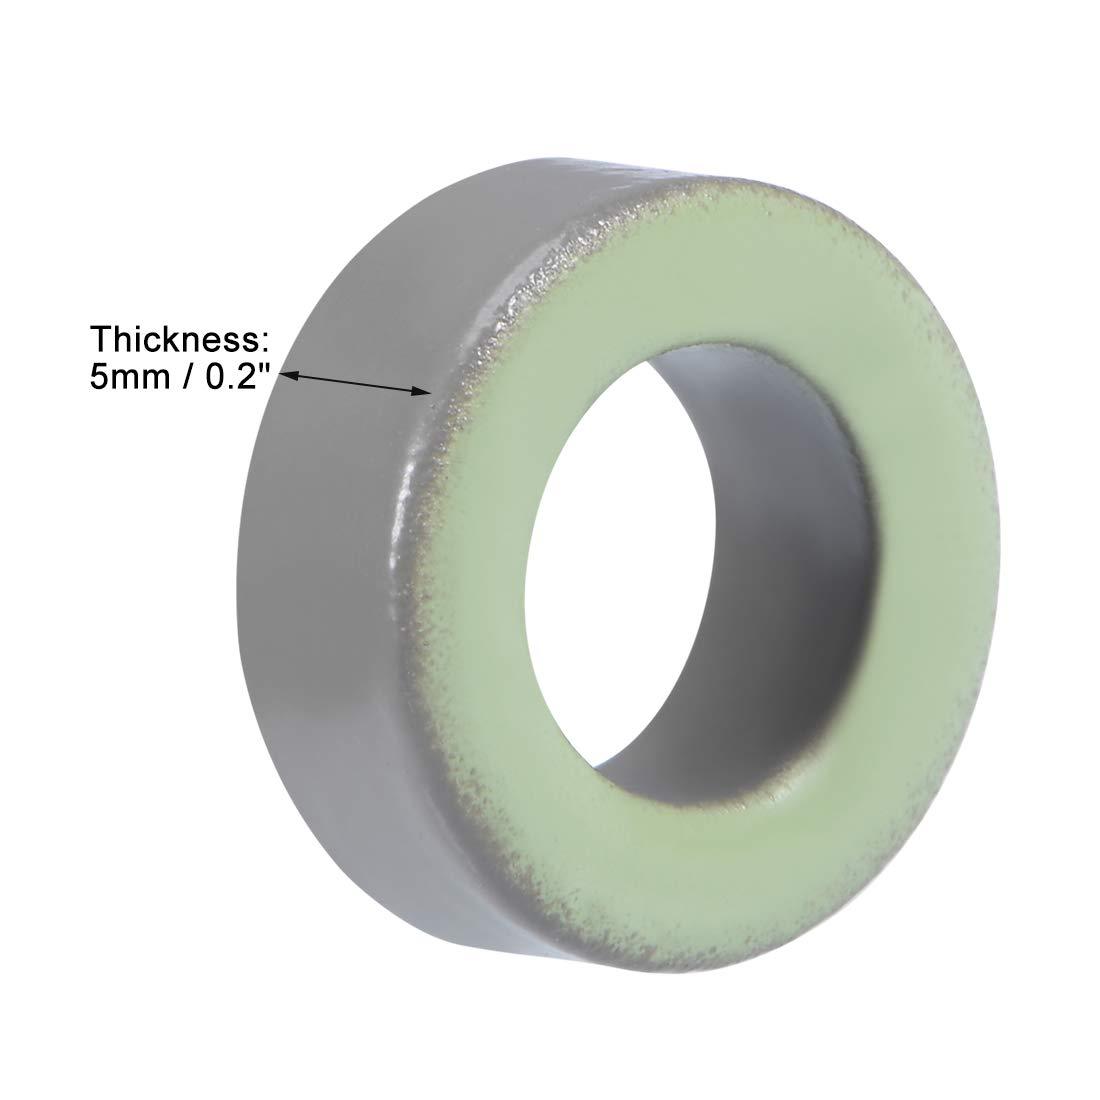 uxcell 5pcs 7.4 x 13.3 x 5mm Ferrite Ring Iron Powder Toroid Cores Gray Light Green